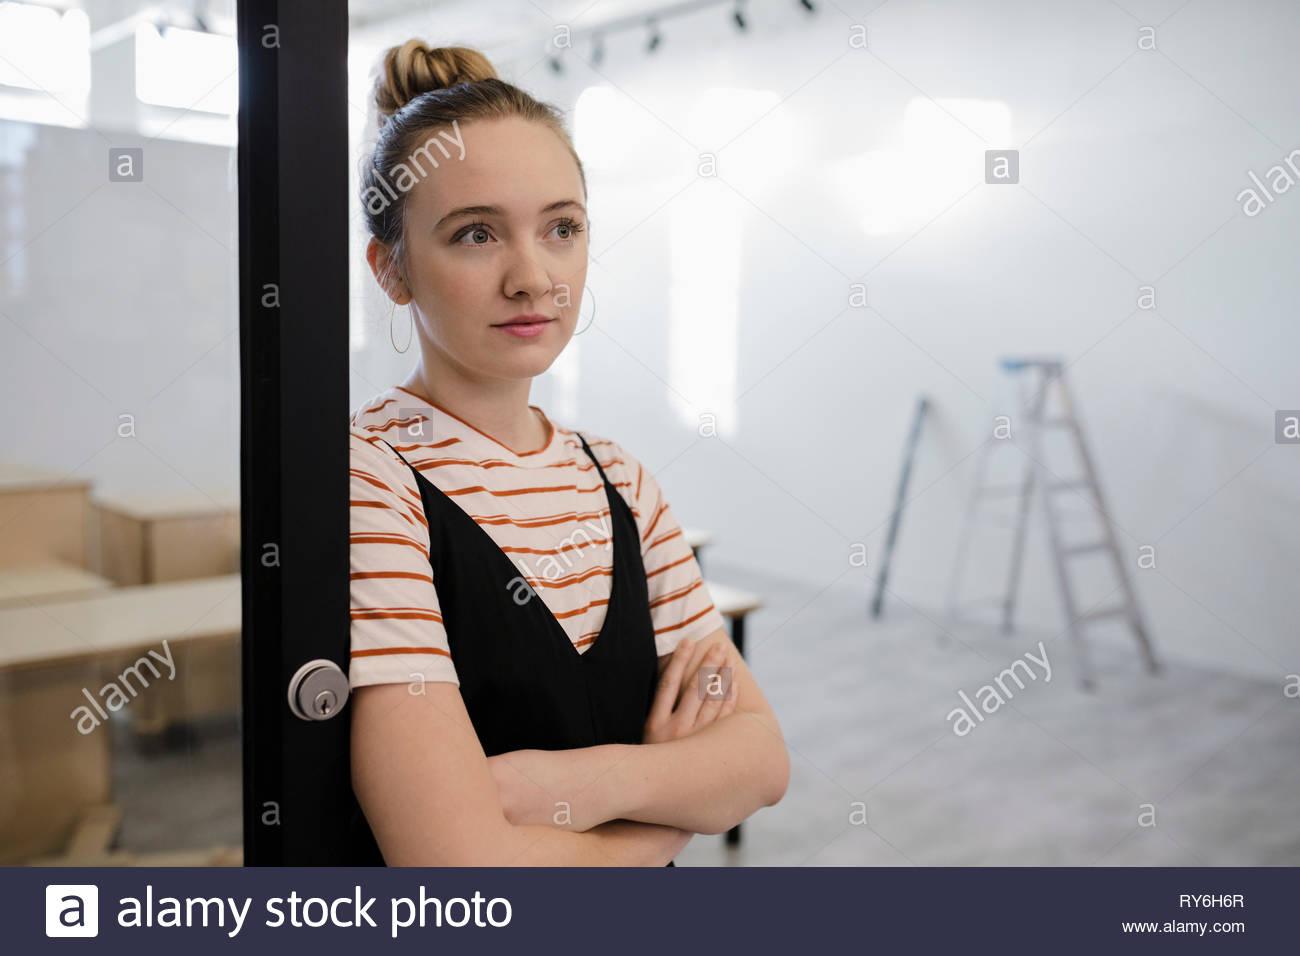 Thoughtful female artist standing in art gallery doorway - Stock Image